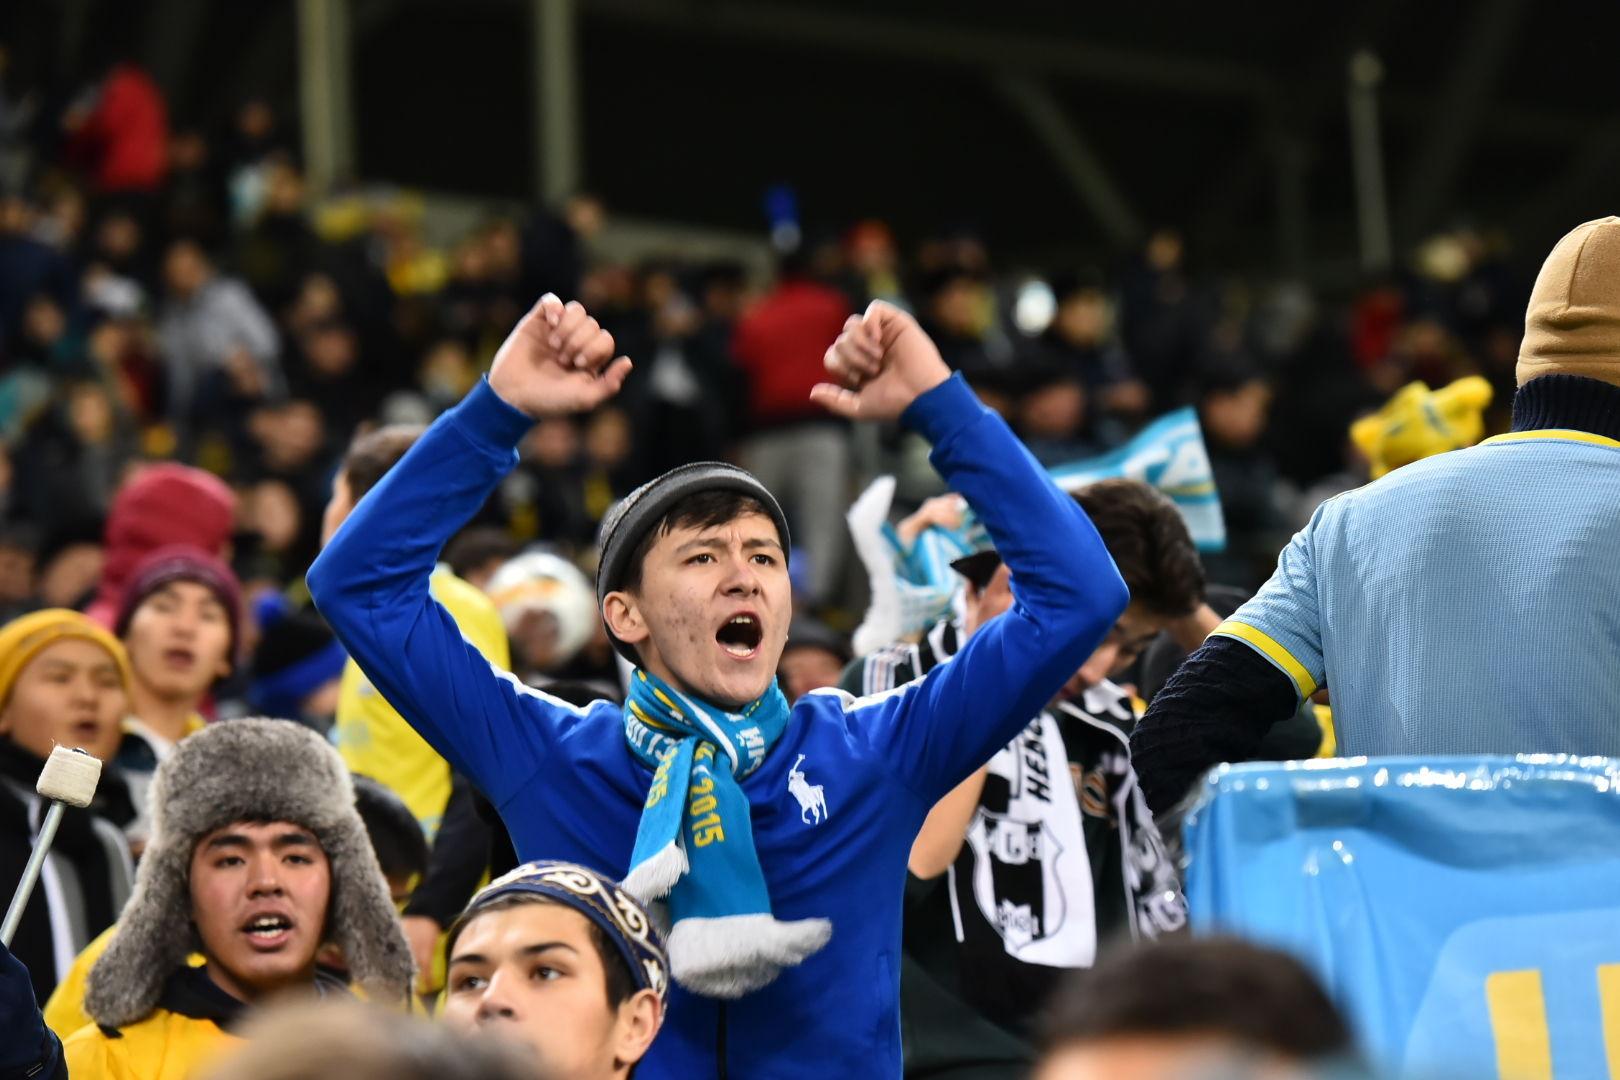 Матч Астана - Манчестер Юнайтед. Болельщики